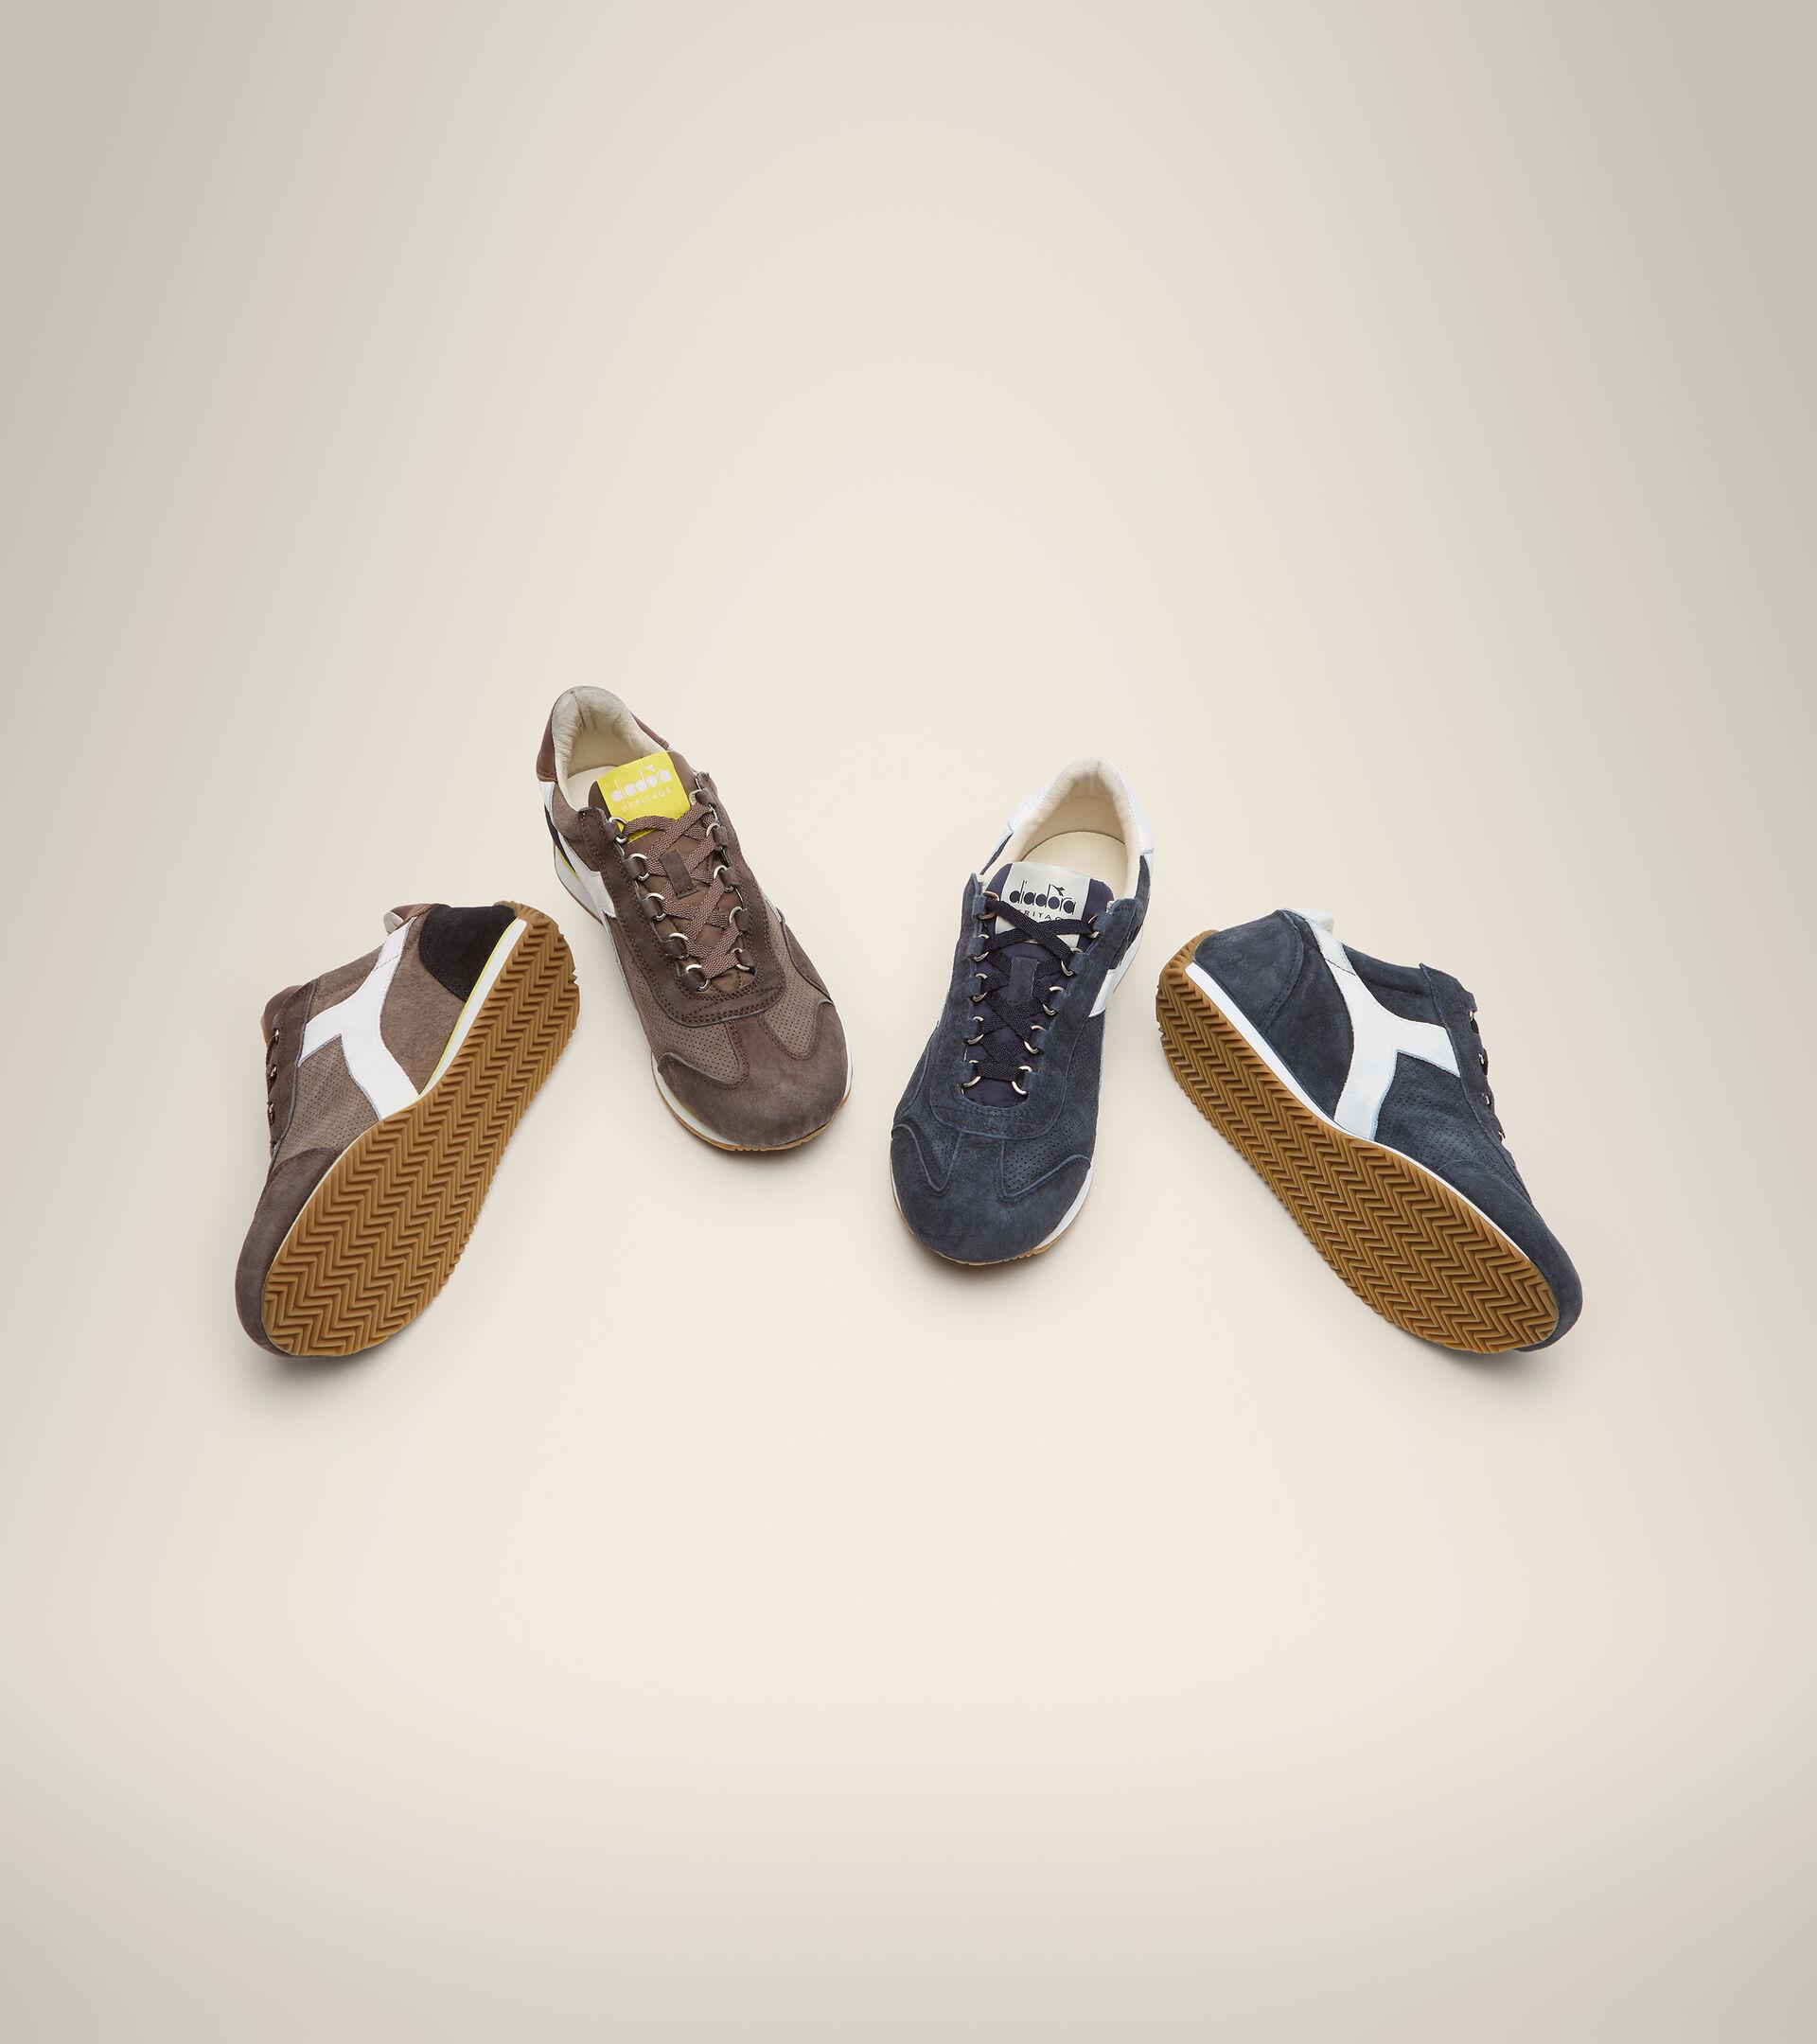 Footwear Heritage UNISEX EQUIPE SUEDE SW MARRON PEPITAS DE CHOCOLATE Diadora